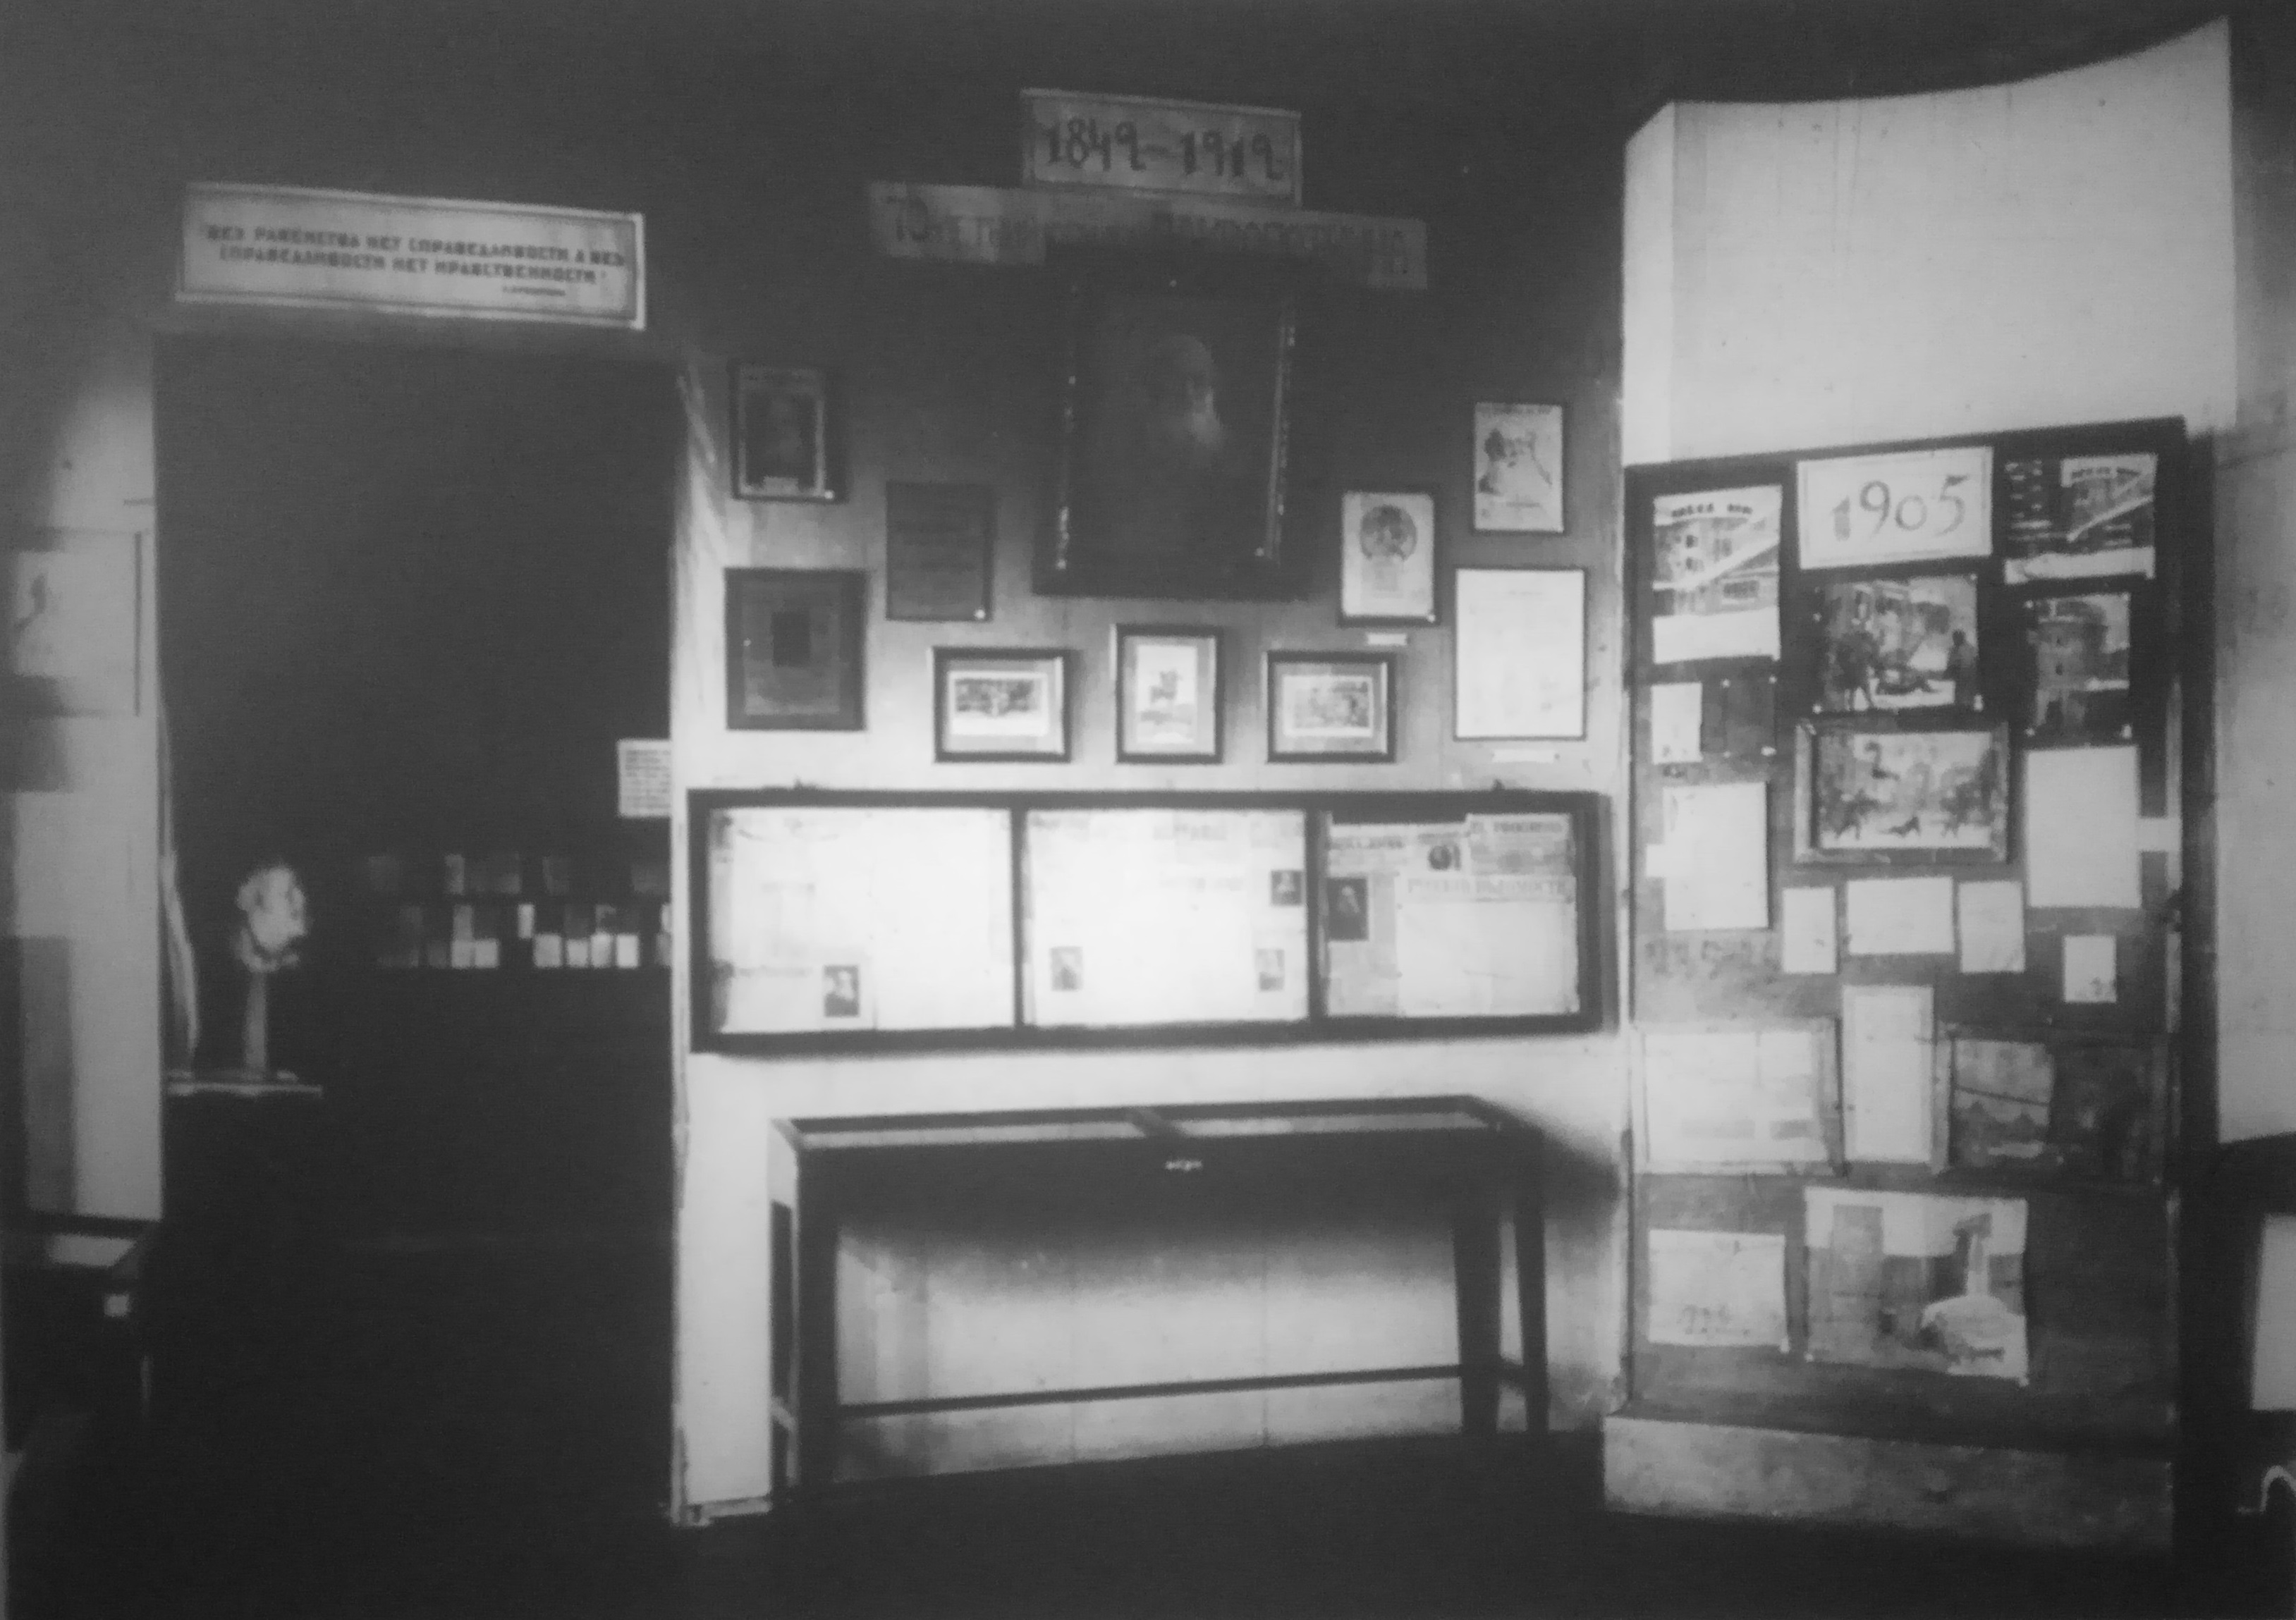 Третья стена третьей комнаты музея П.А.Кропоткина